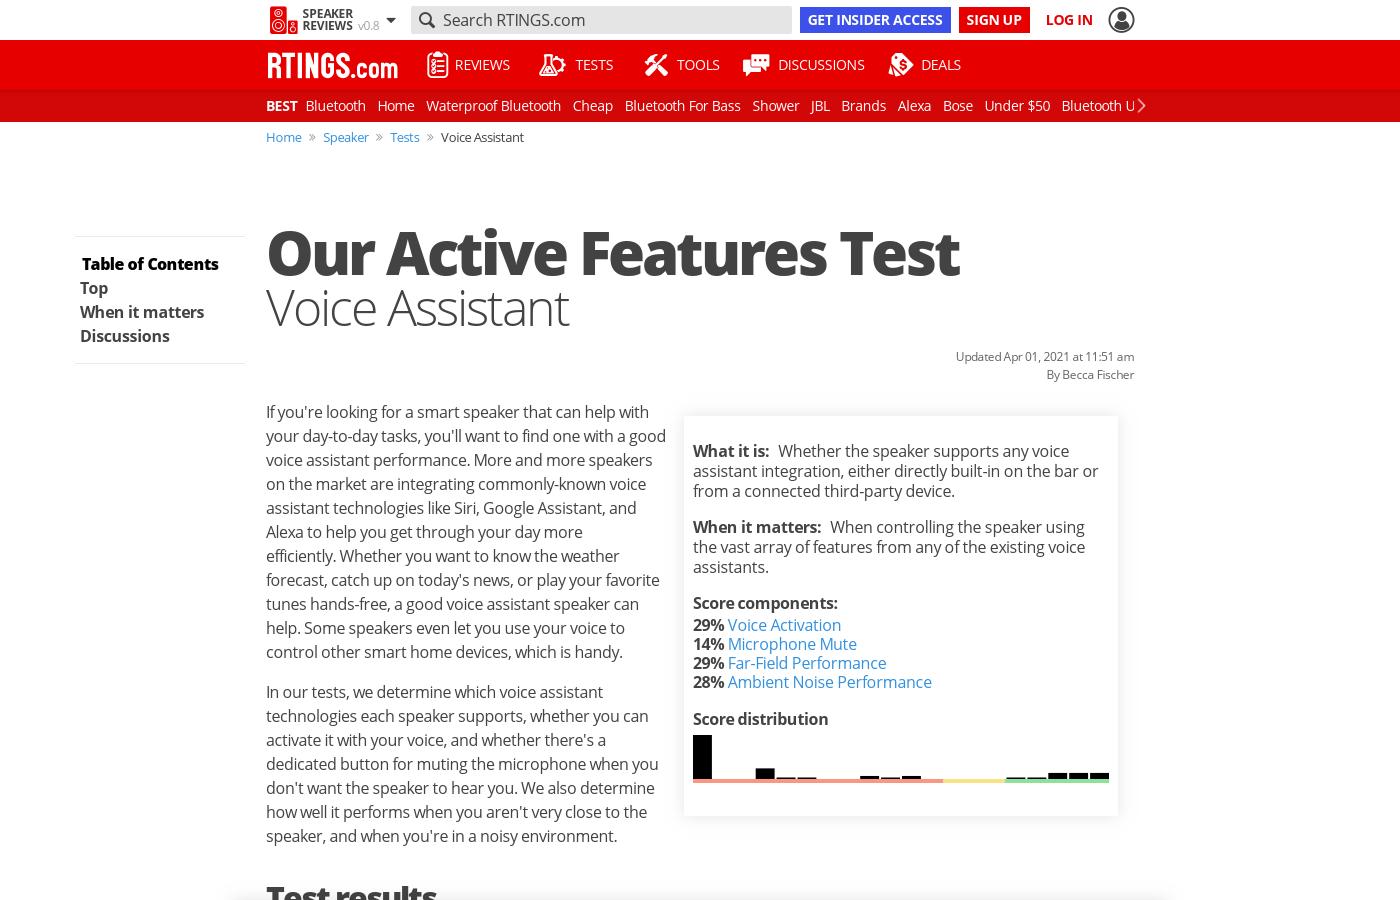 Our Active Features Test: Voice Assistant